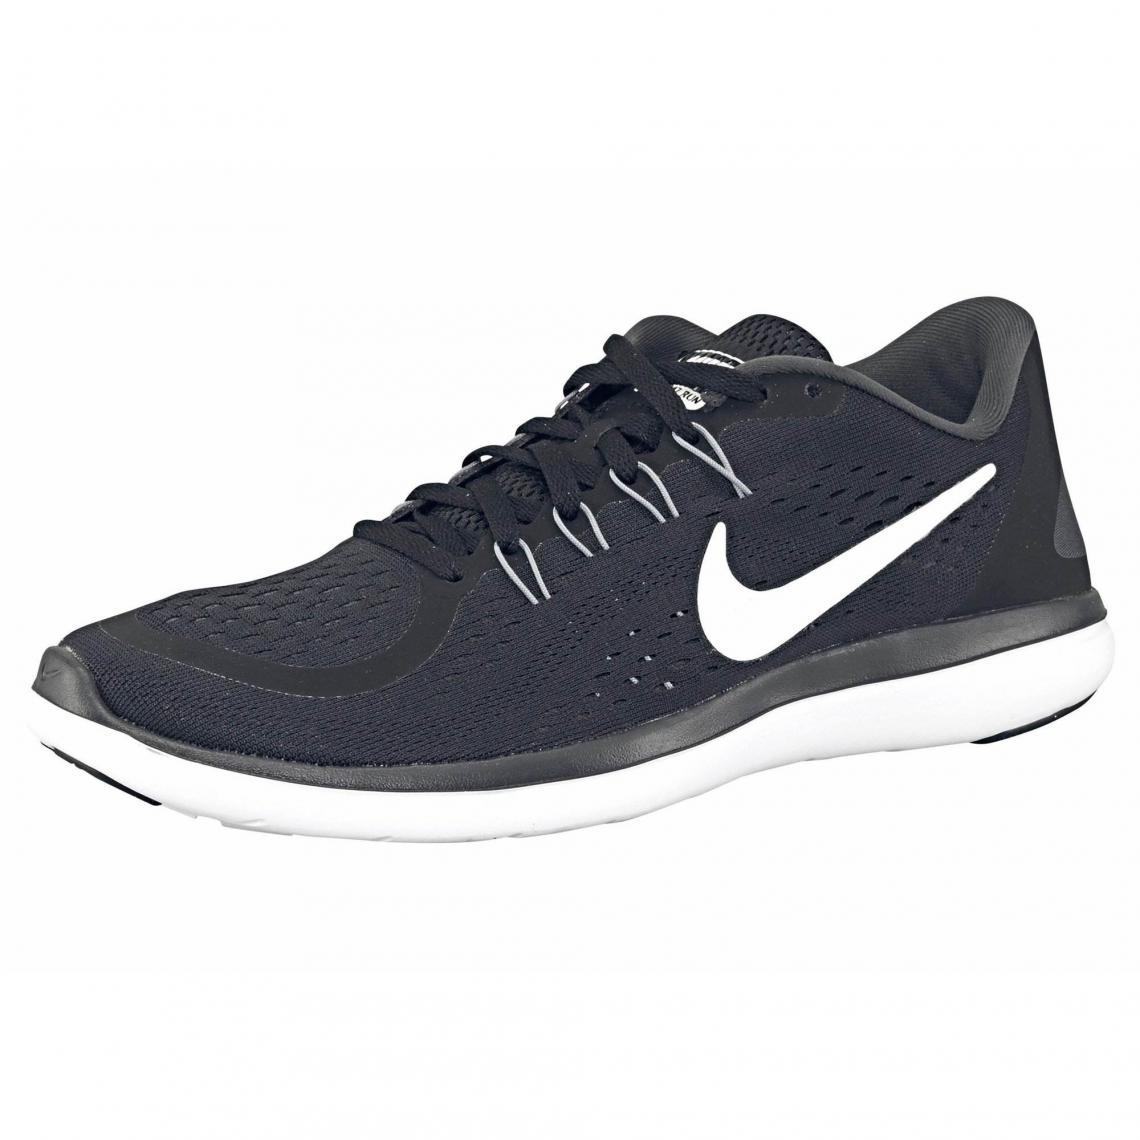 Nike Flex Run 2017 chaussures running homme Noir | 3 SUISSES